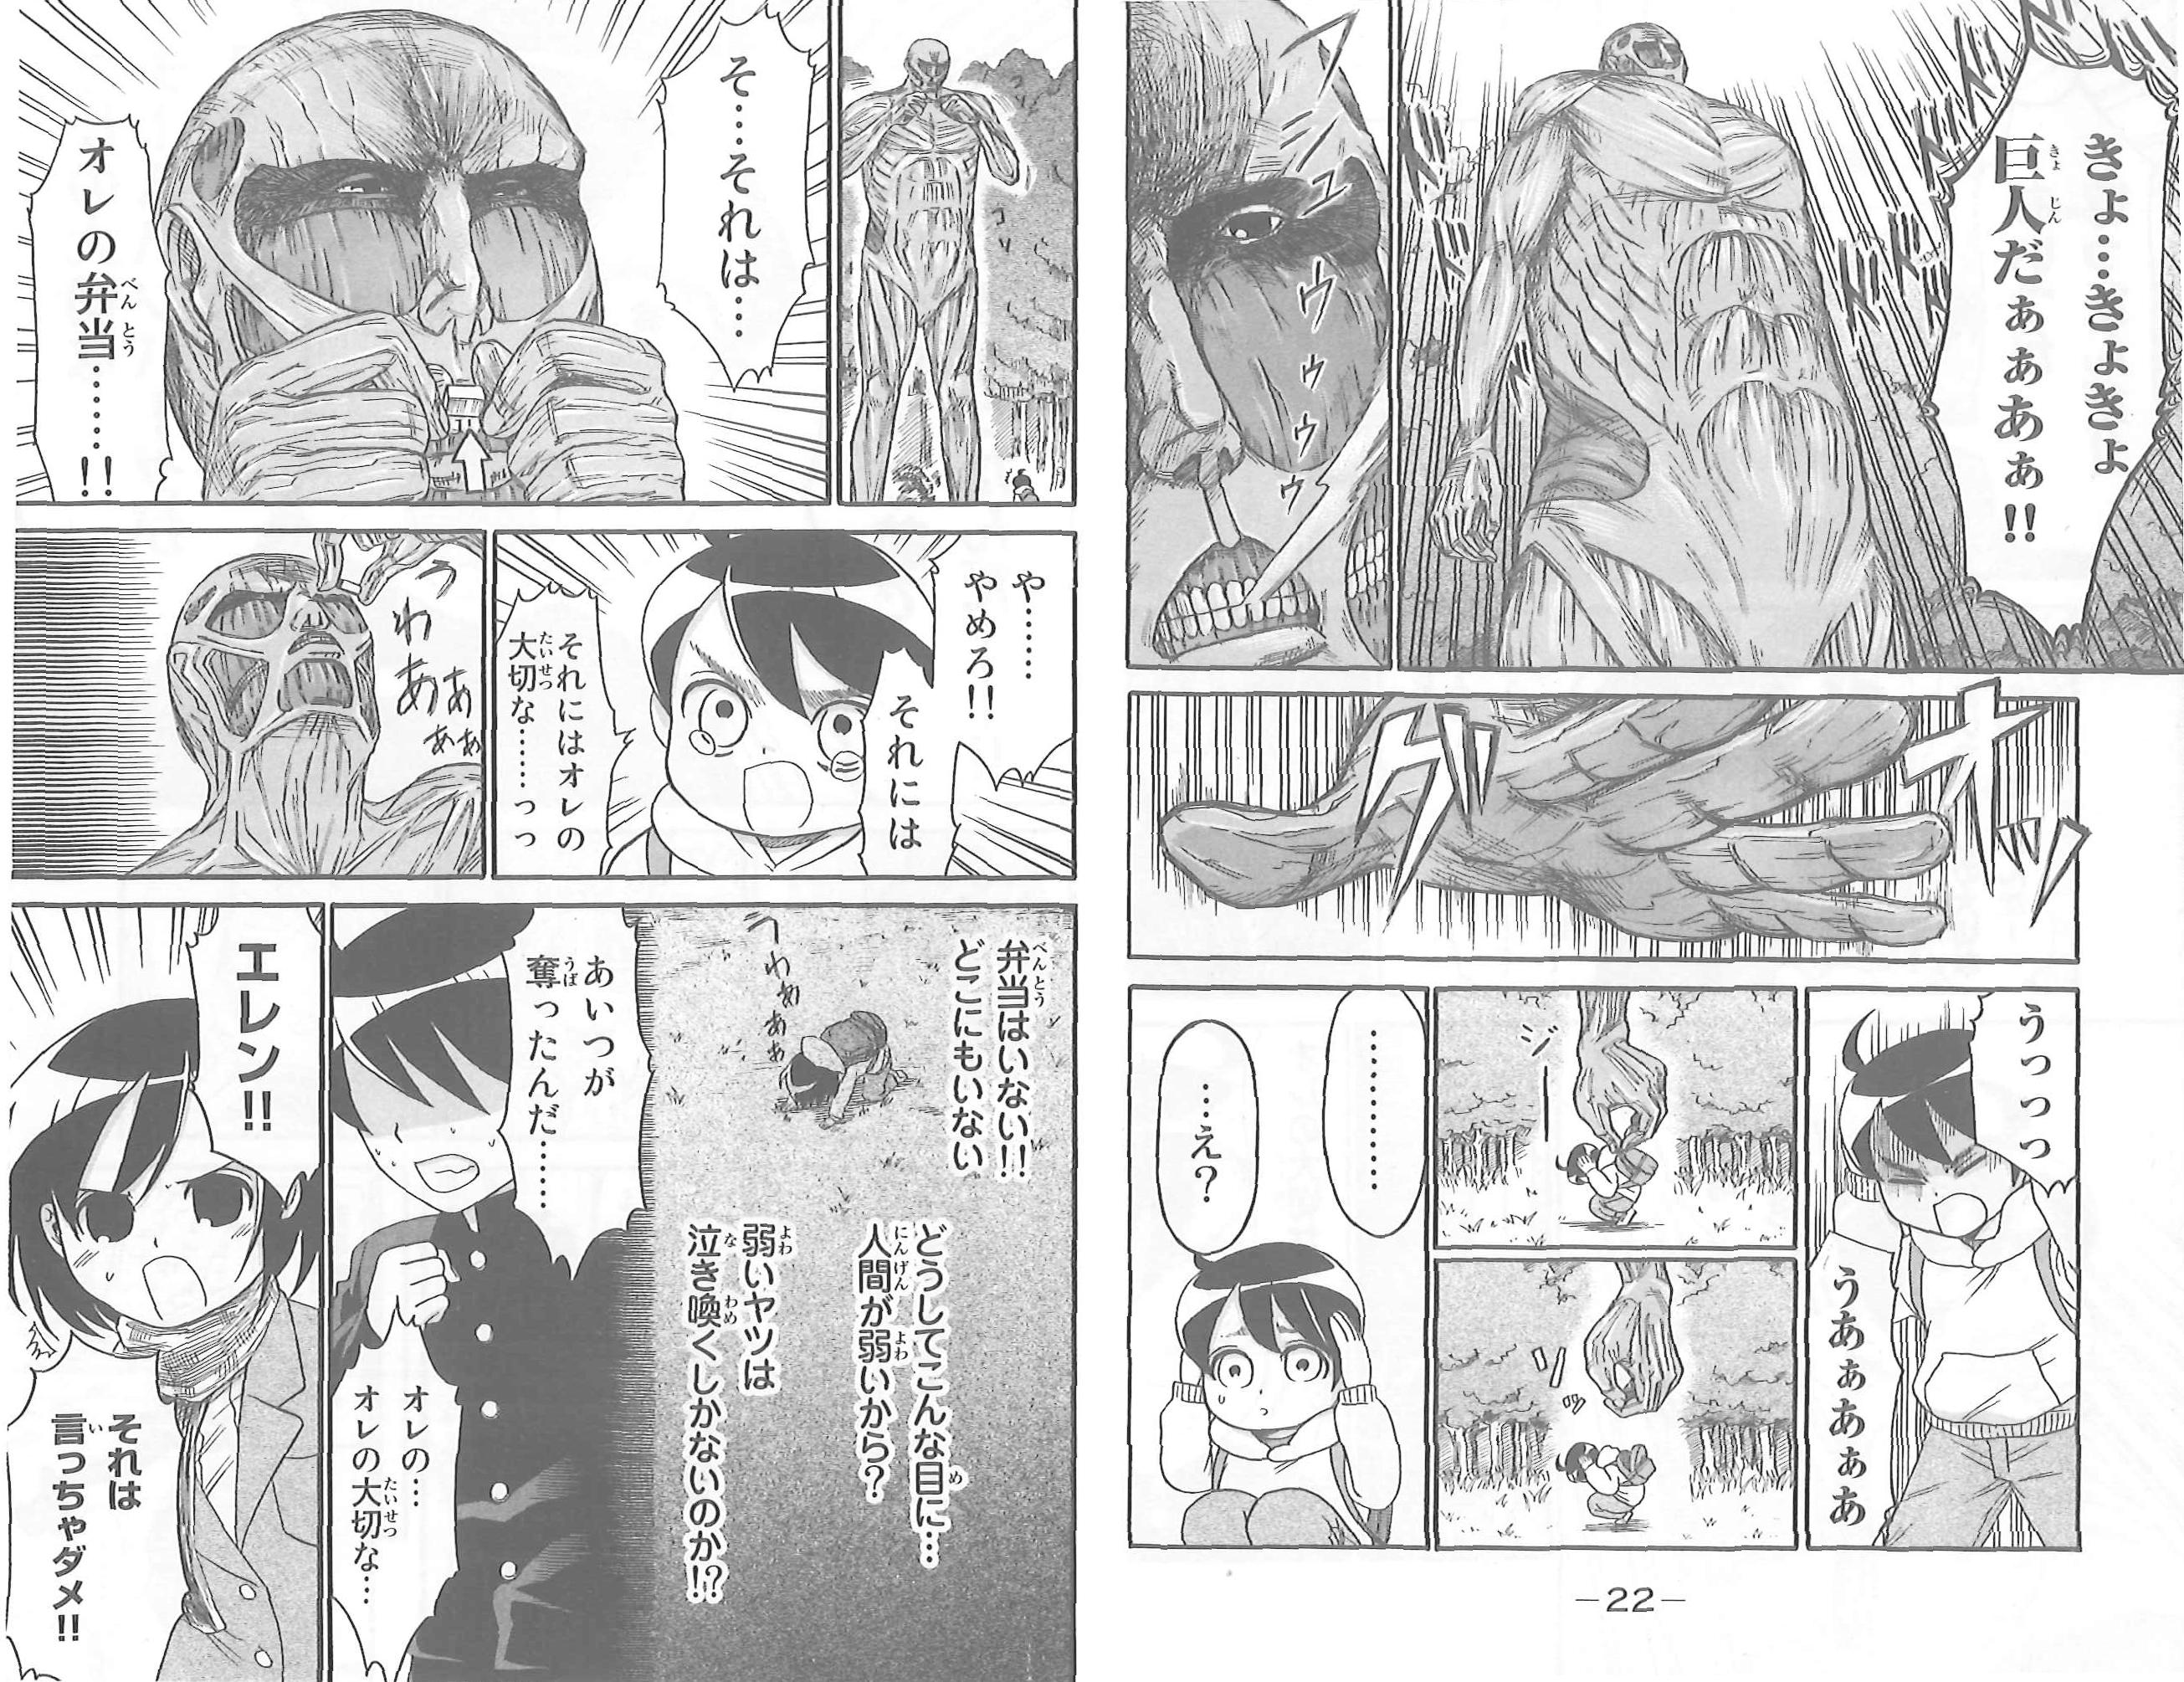 Attack on Titan: Junior High Manga Vol. 1 @Archonia_US